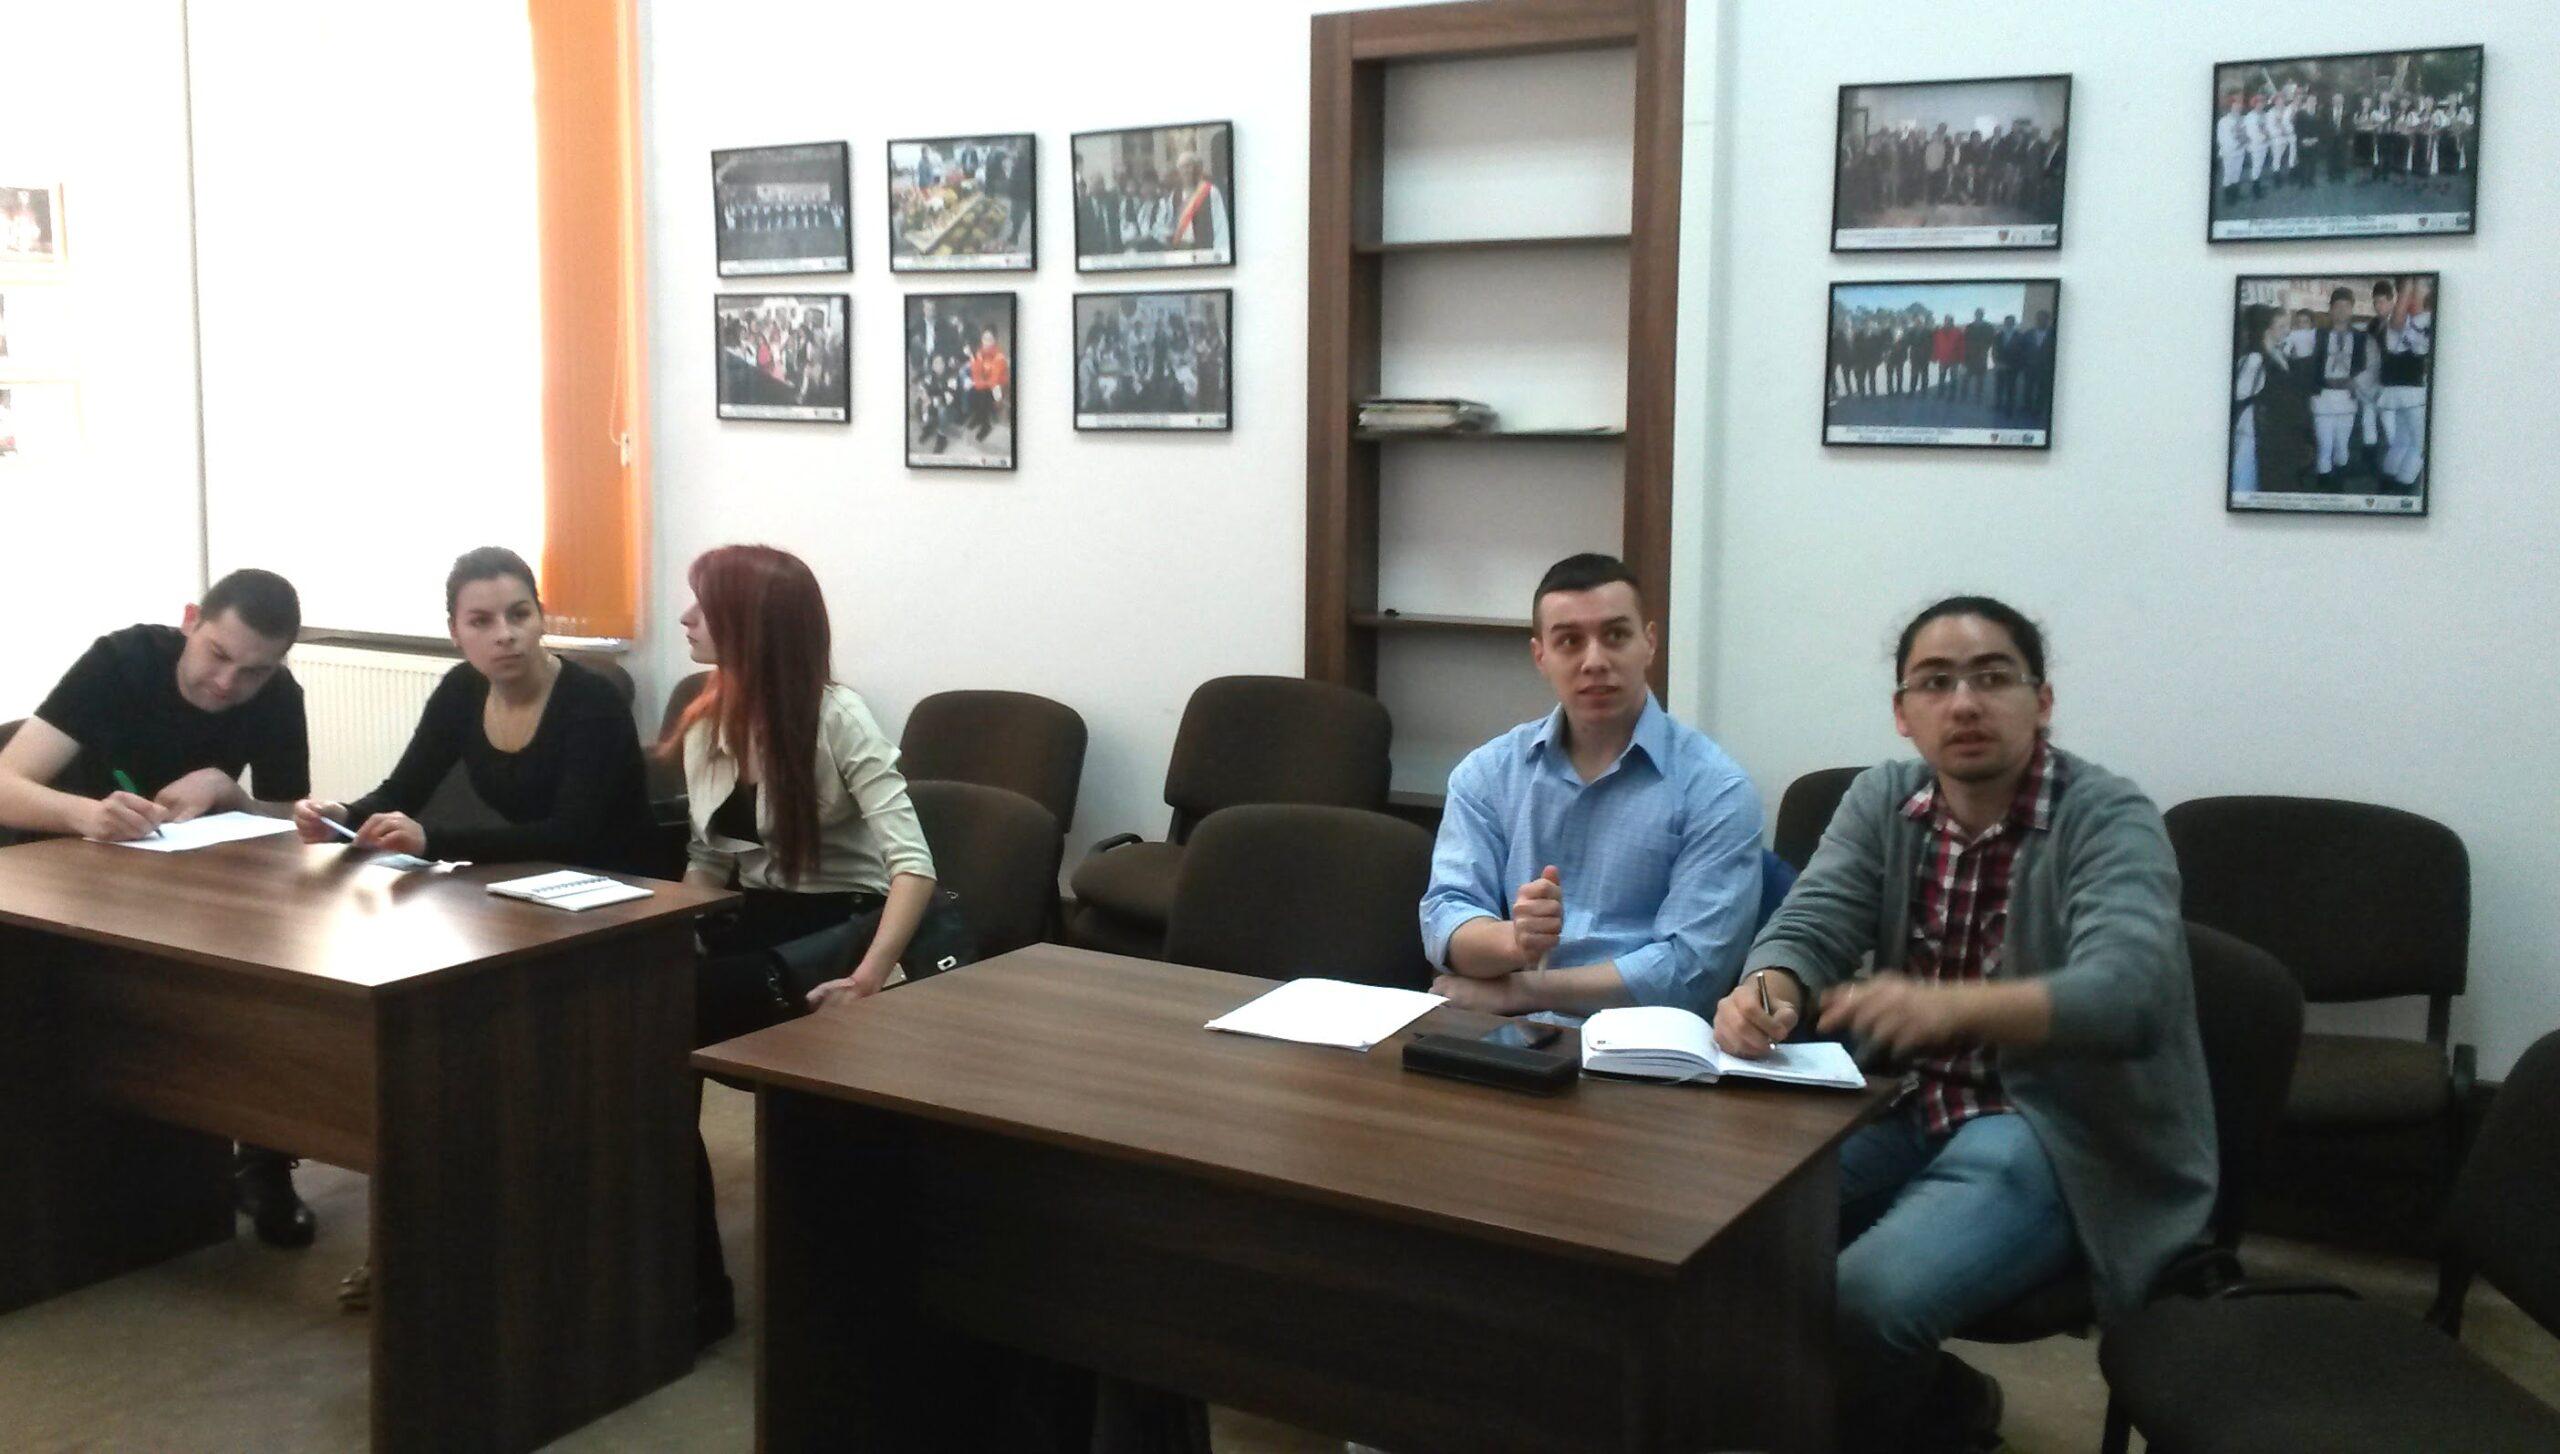 Studenti de la Stiinte Economice fac practica la Consiliul Judetean Sibiu